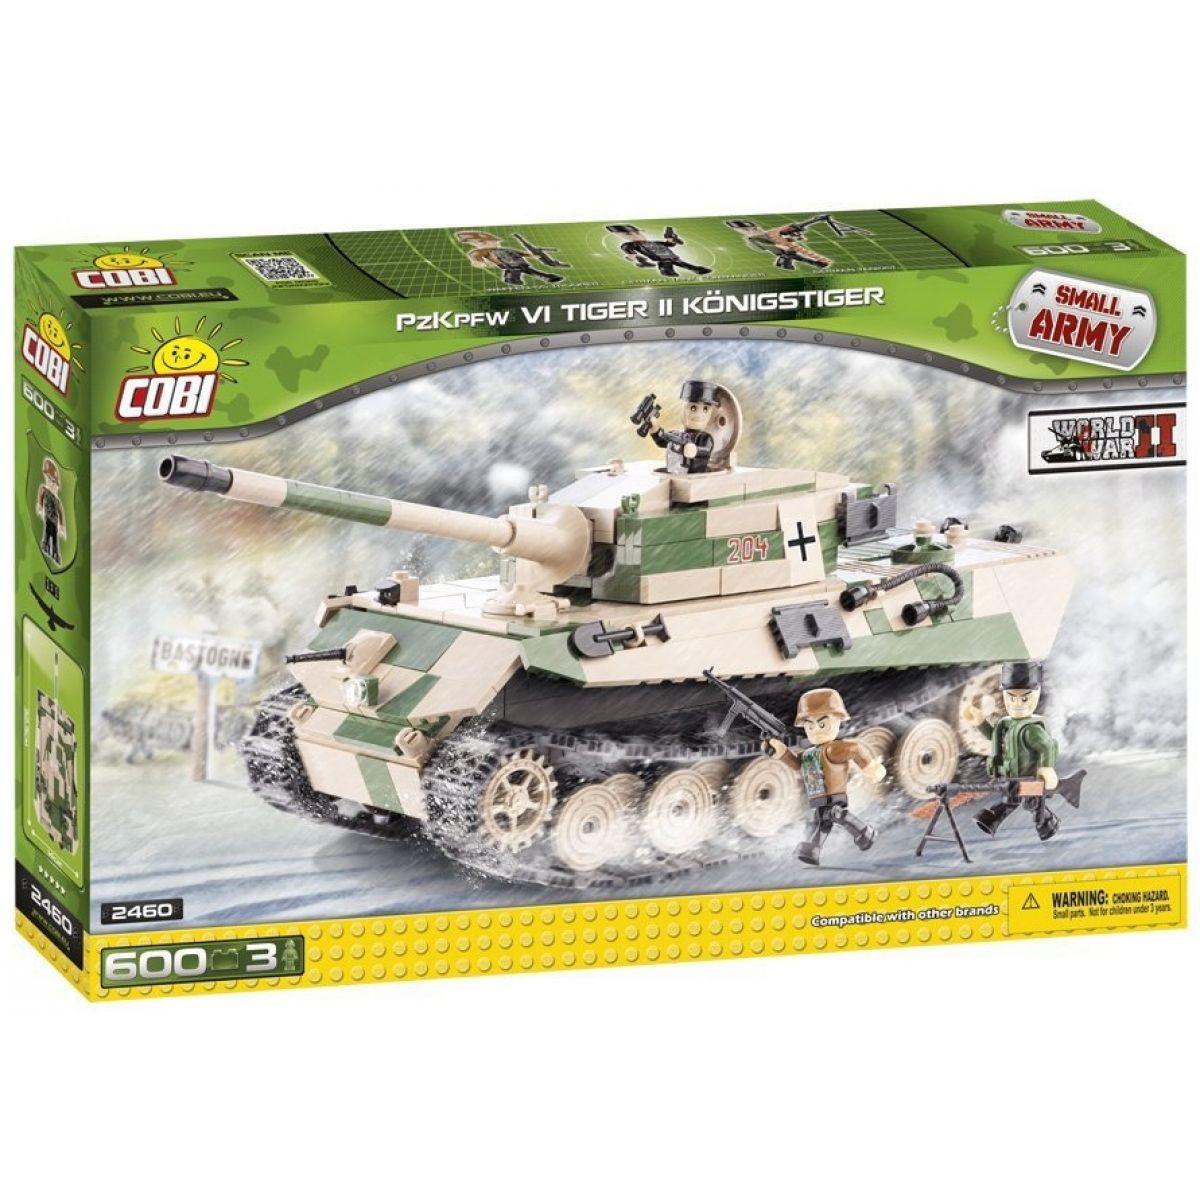 COBI 2460 - II. světová válka Tank Tiger II Königstiger